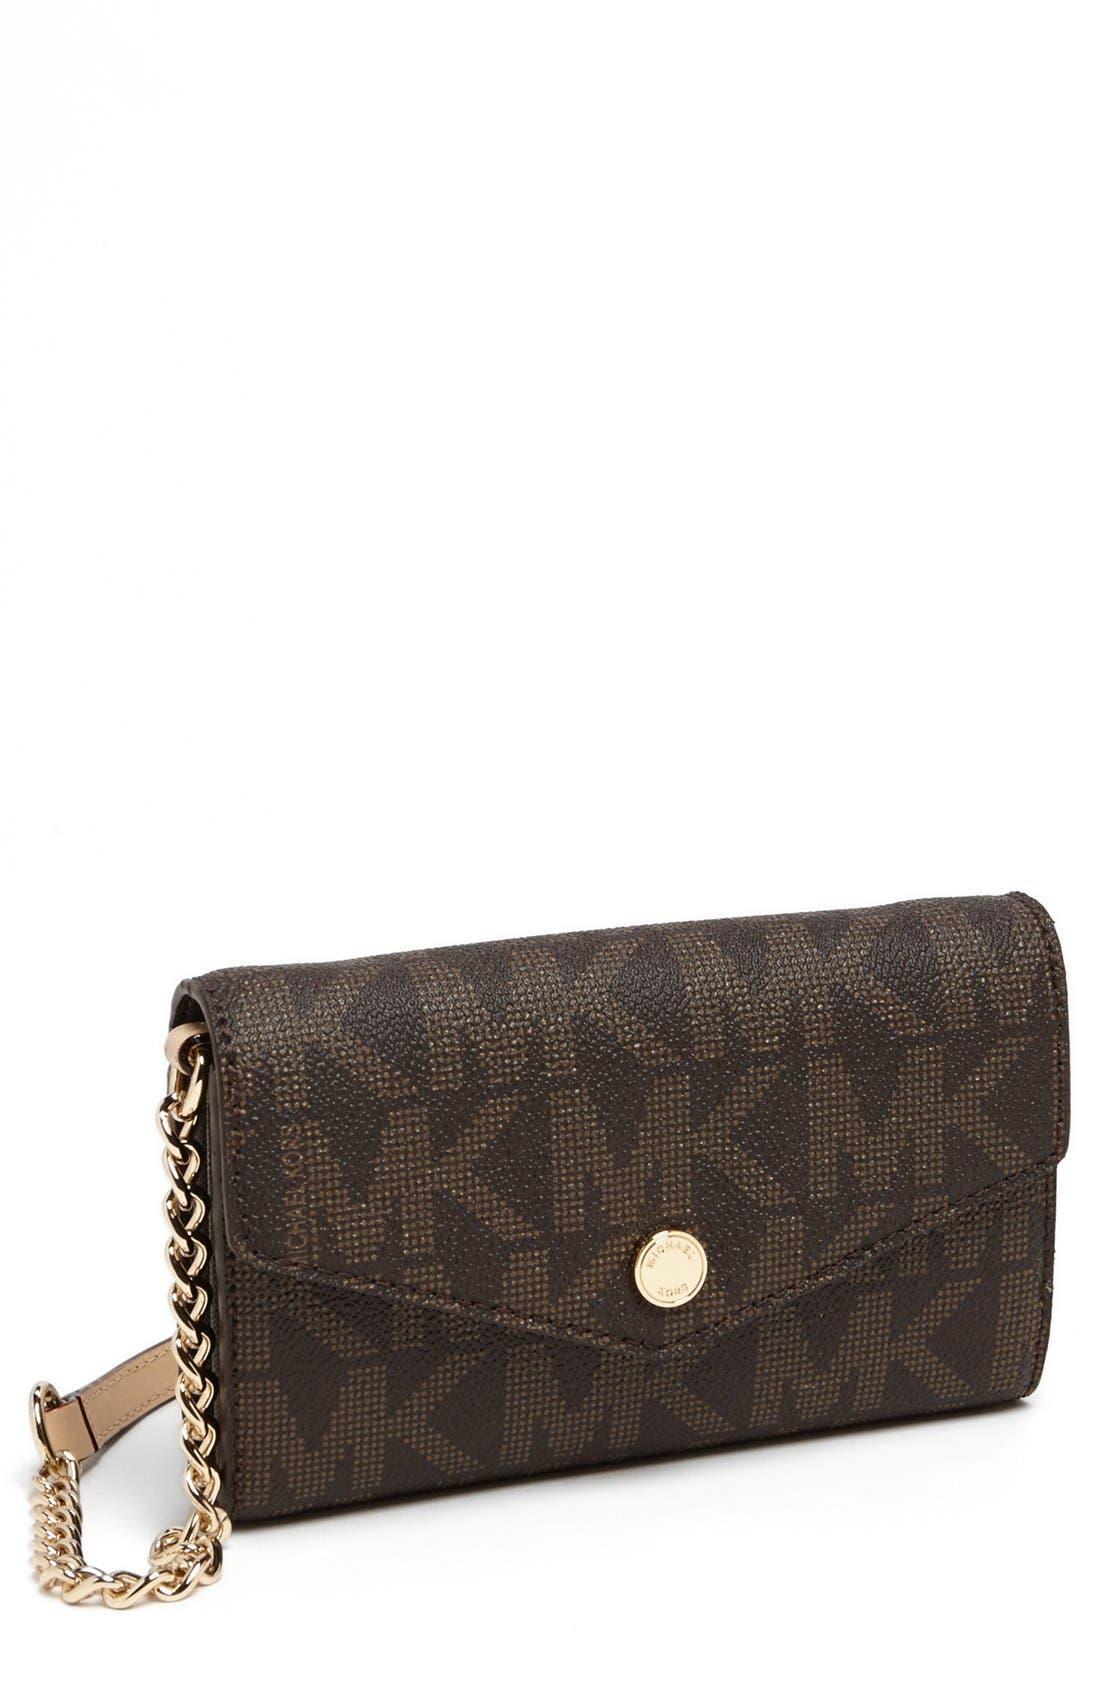 Main Image - MICHAEL Michael Kors 'Signature - Saffiano' Crossbody Phone Bag